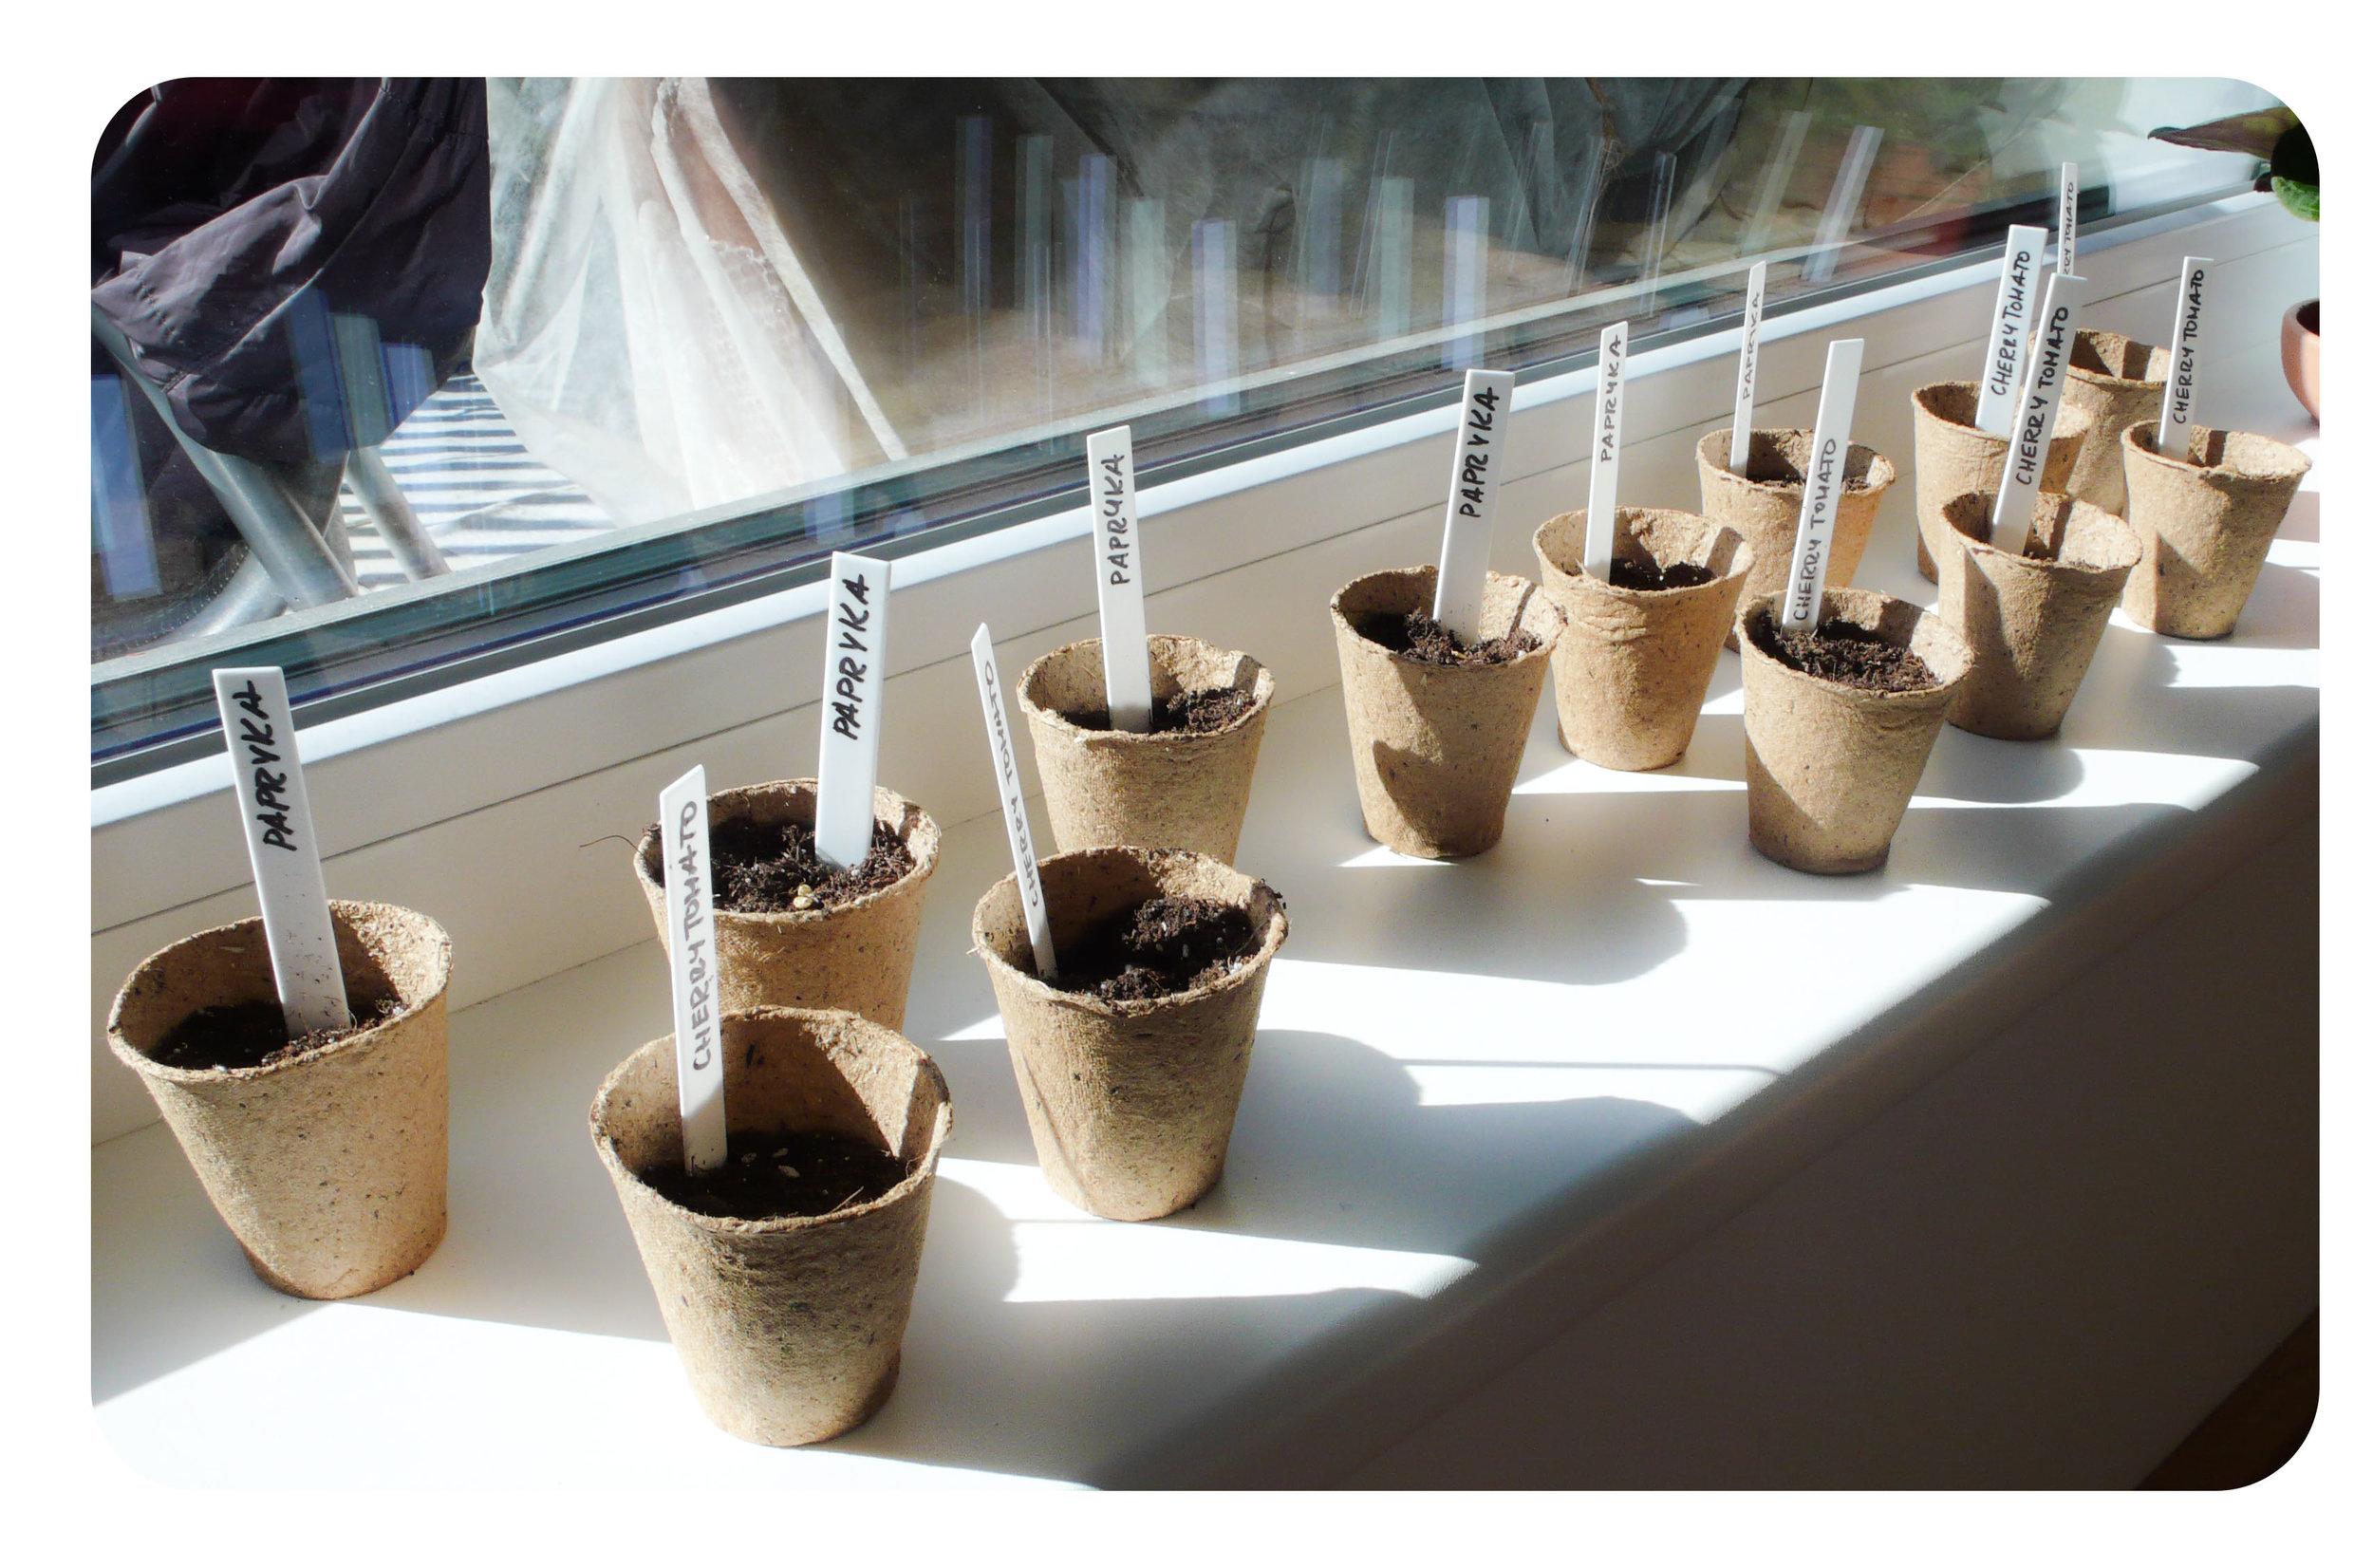 planting7.jpg